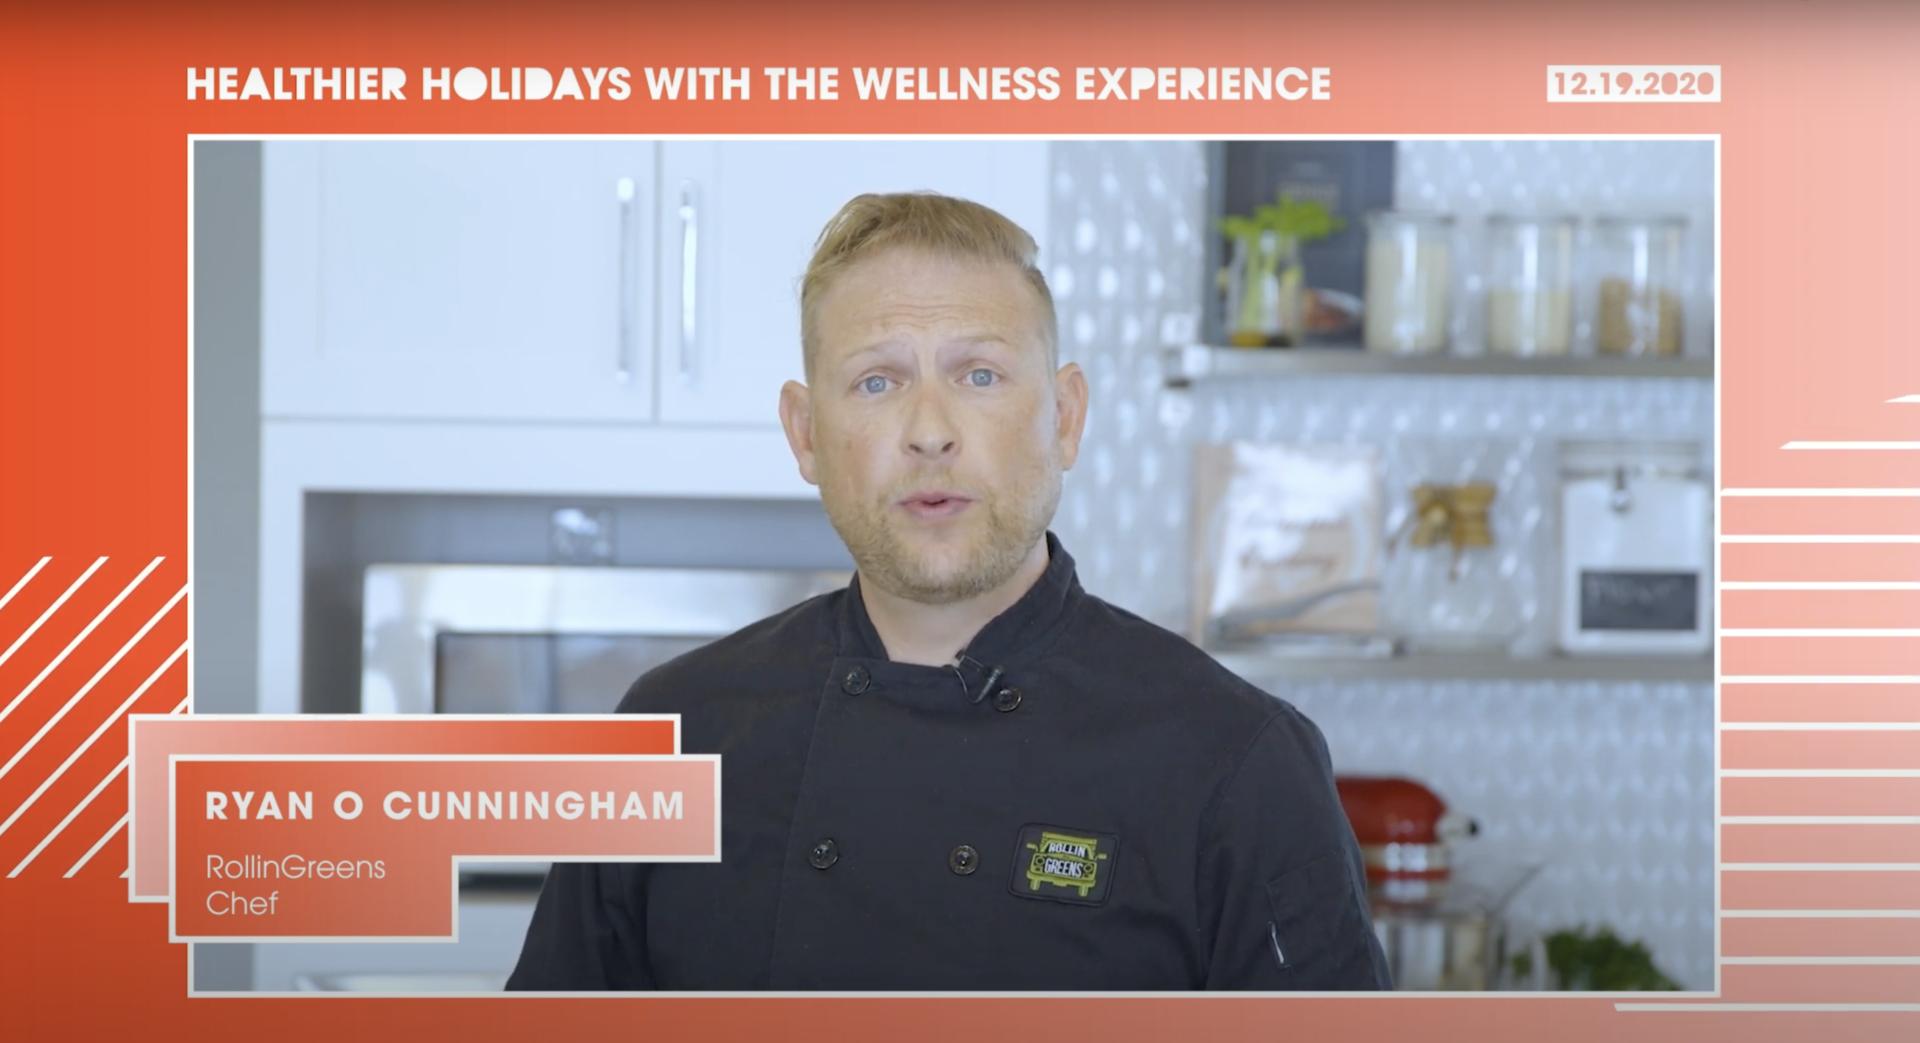 Teriyaki & Pineapple Eggroll with RollinGreens | Chef Ryan O Cunningham